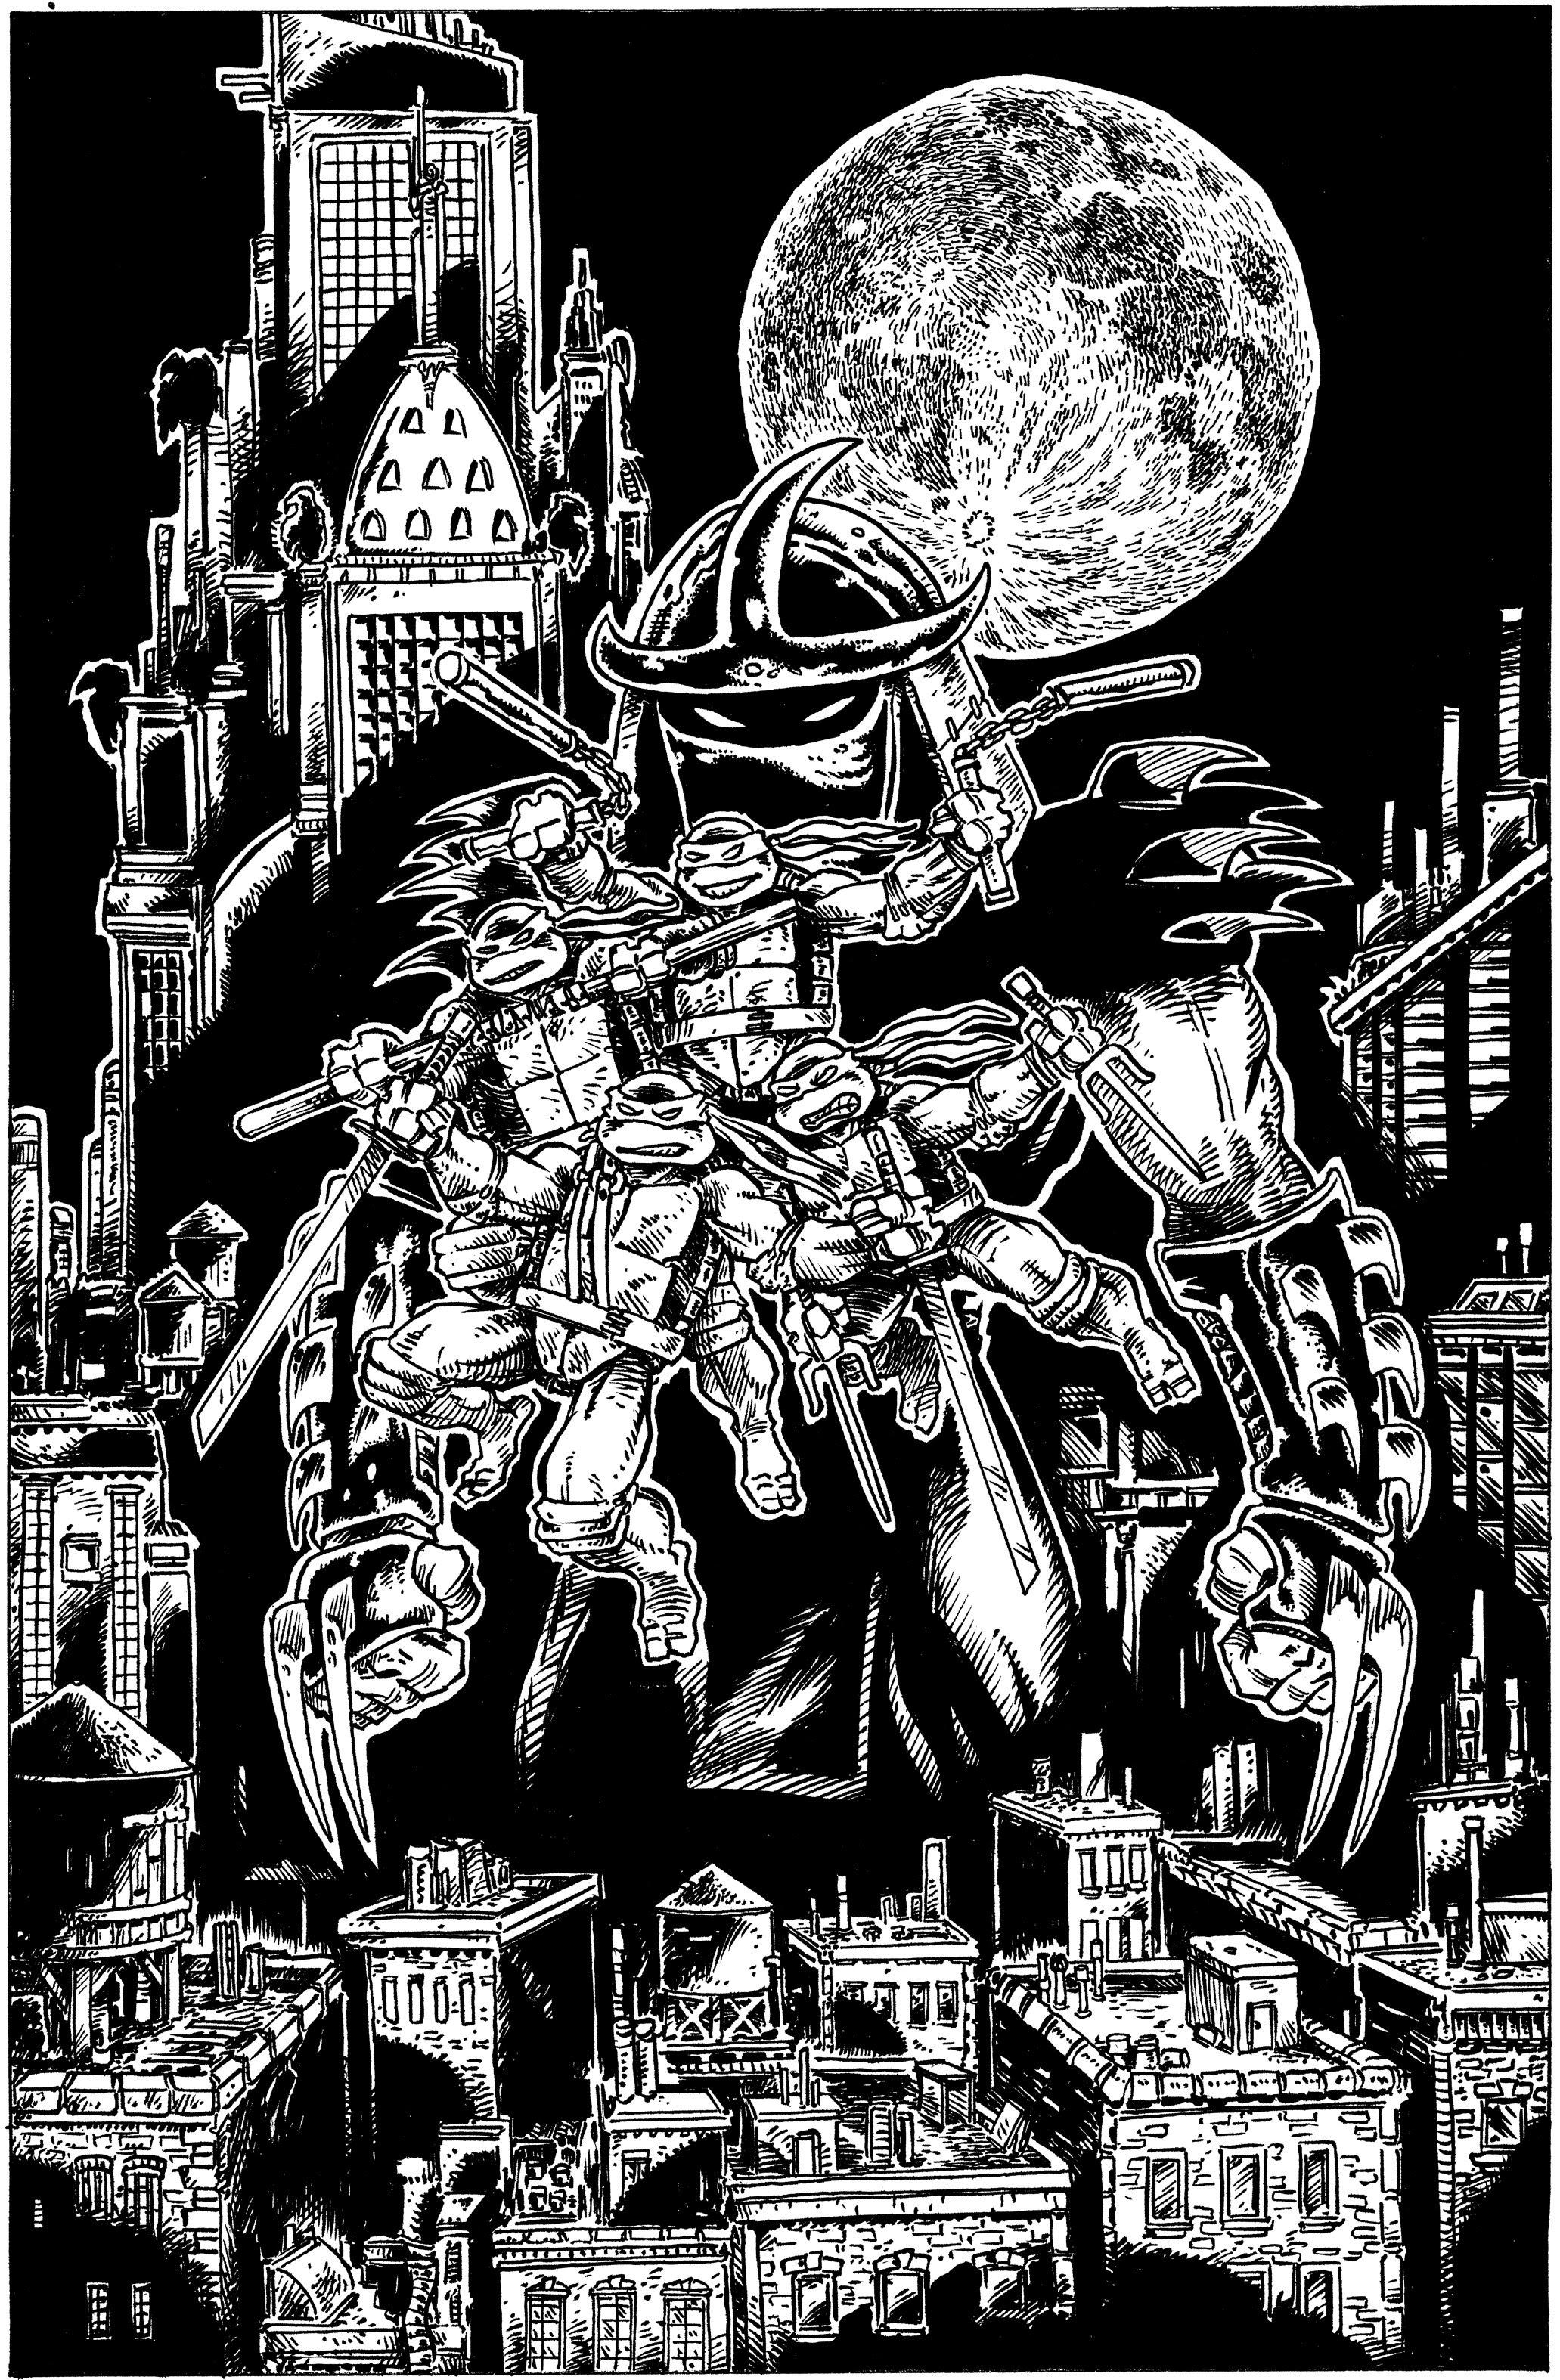 The Last Ronin Takes The Teenage Mutant Ninja Turtles Into A Dark